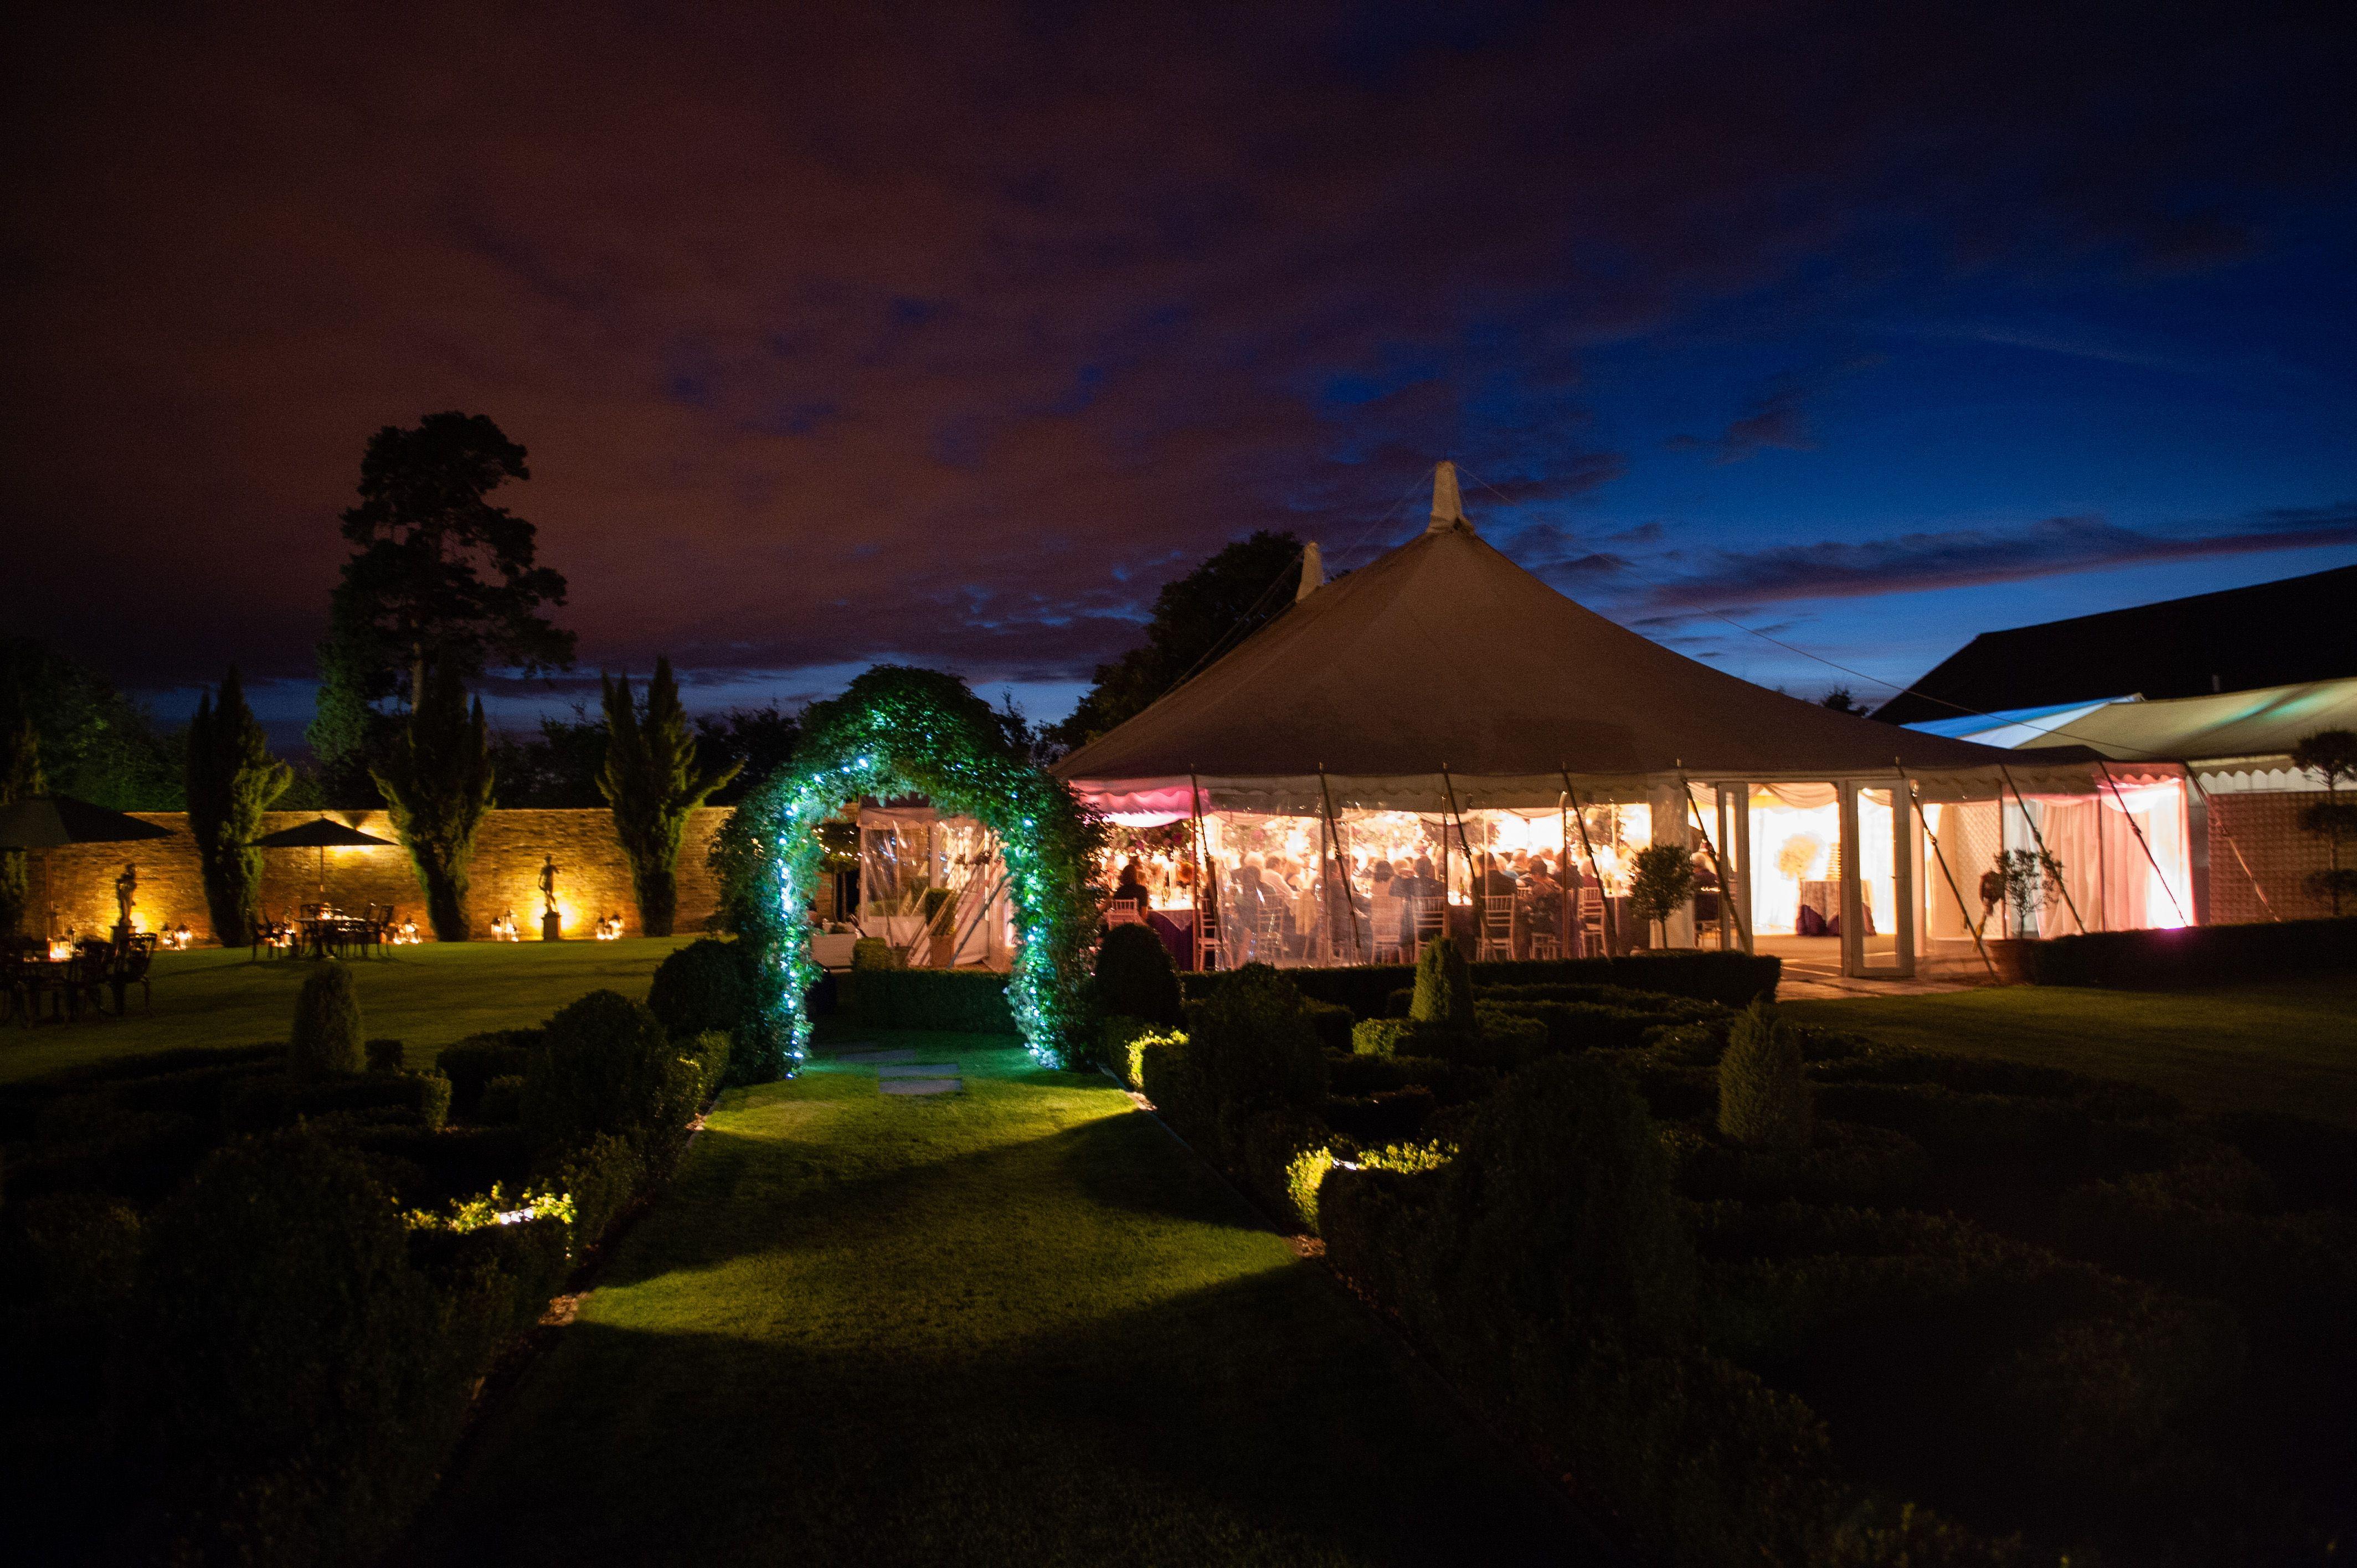 Twilight at Parley Manor | Rustic wedding, Patio umbrella ...